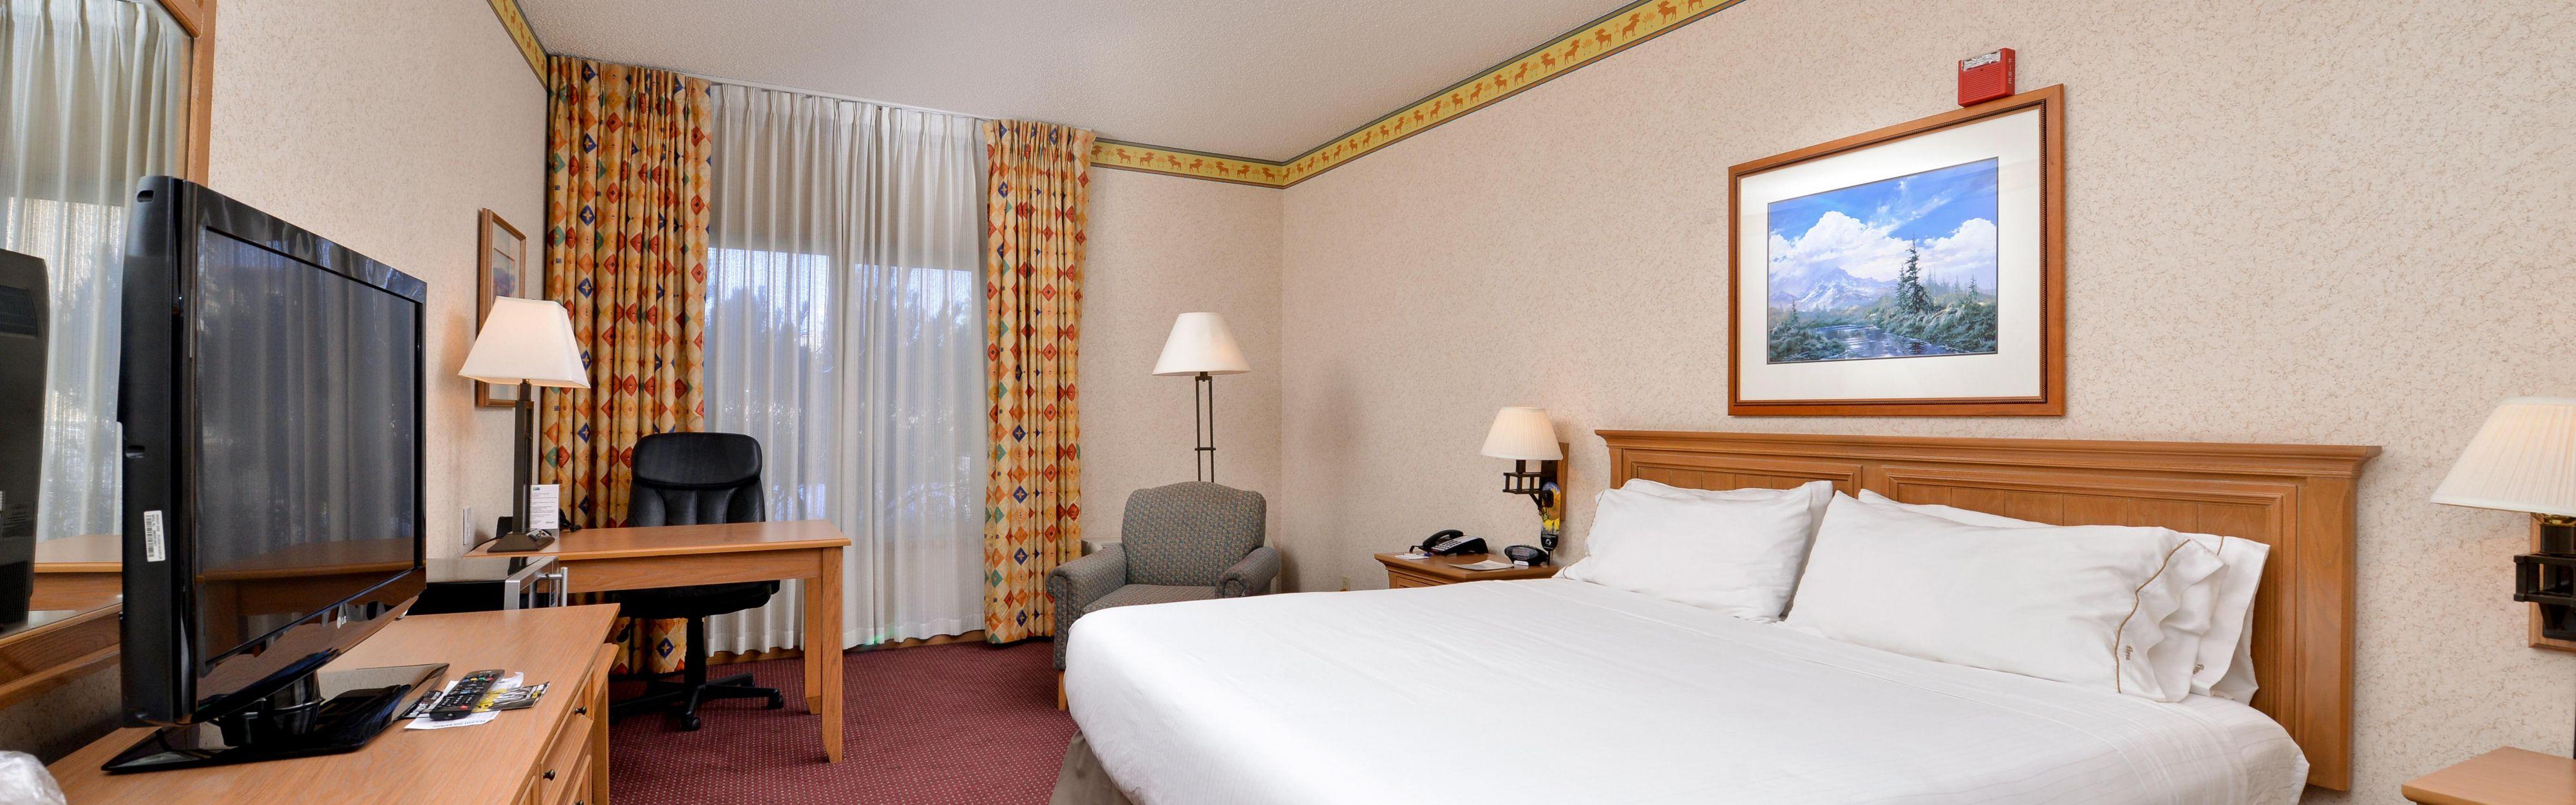 Holiday Inn Express & Suites Elko image 1